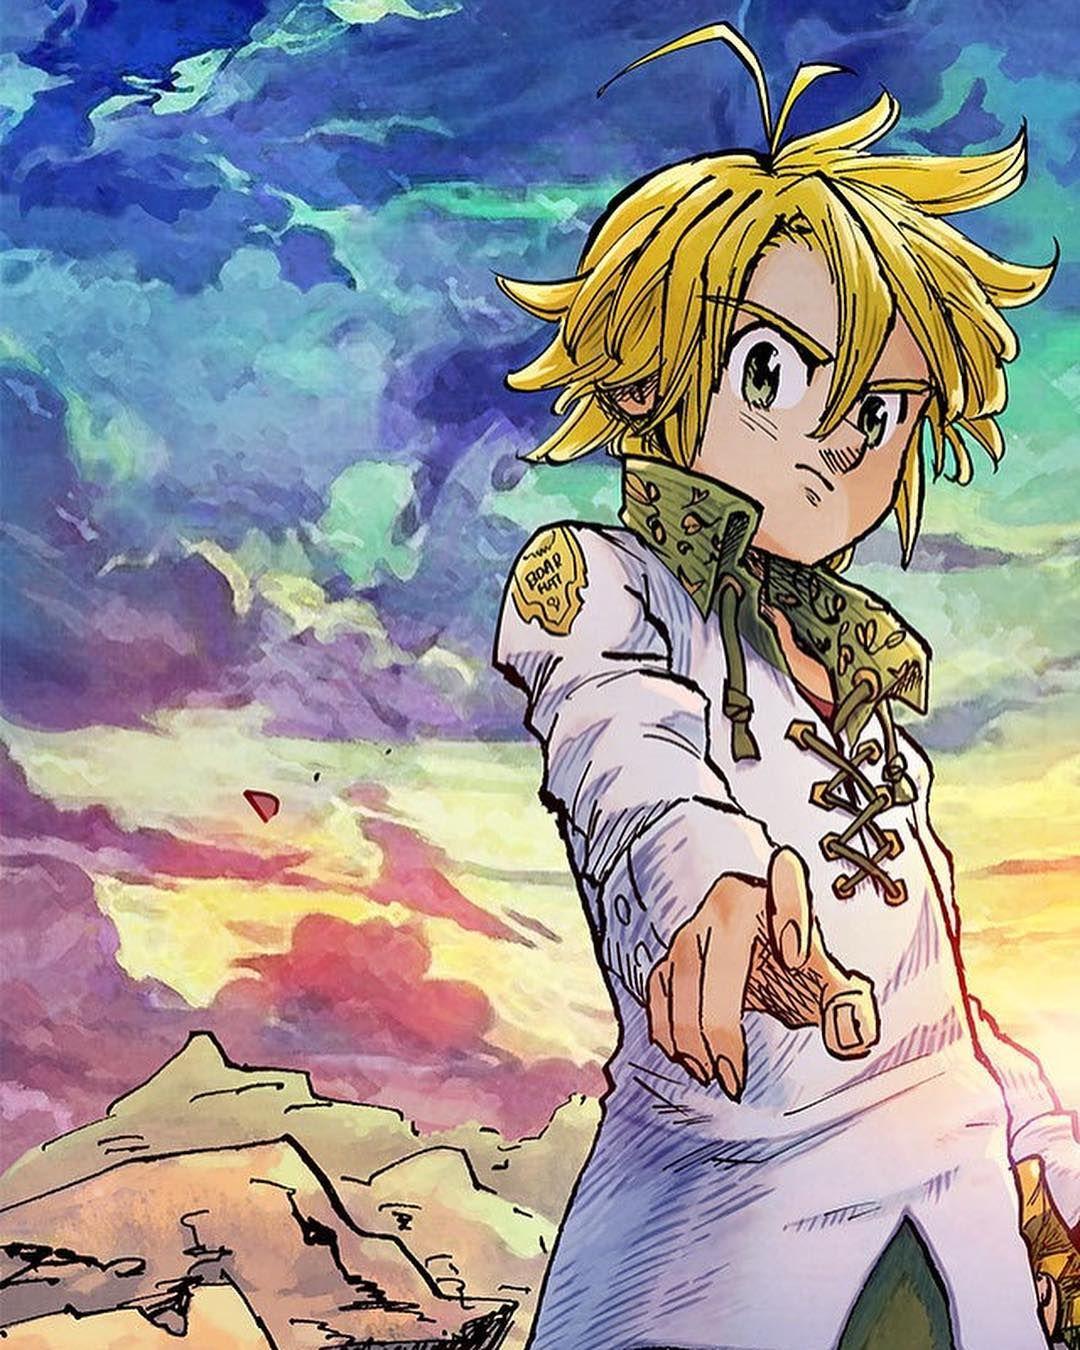 Pin by Jordannoad on Meliodas Anime, Sketches, Seven